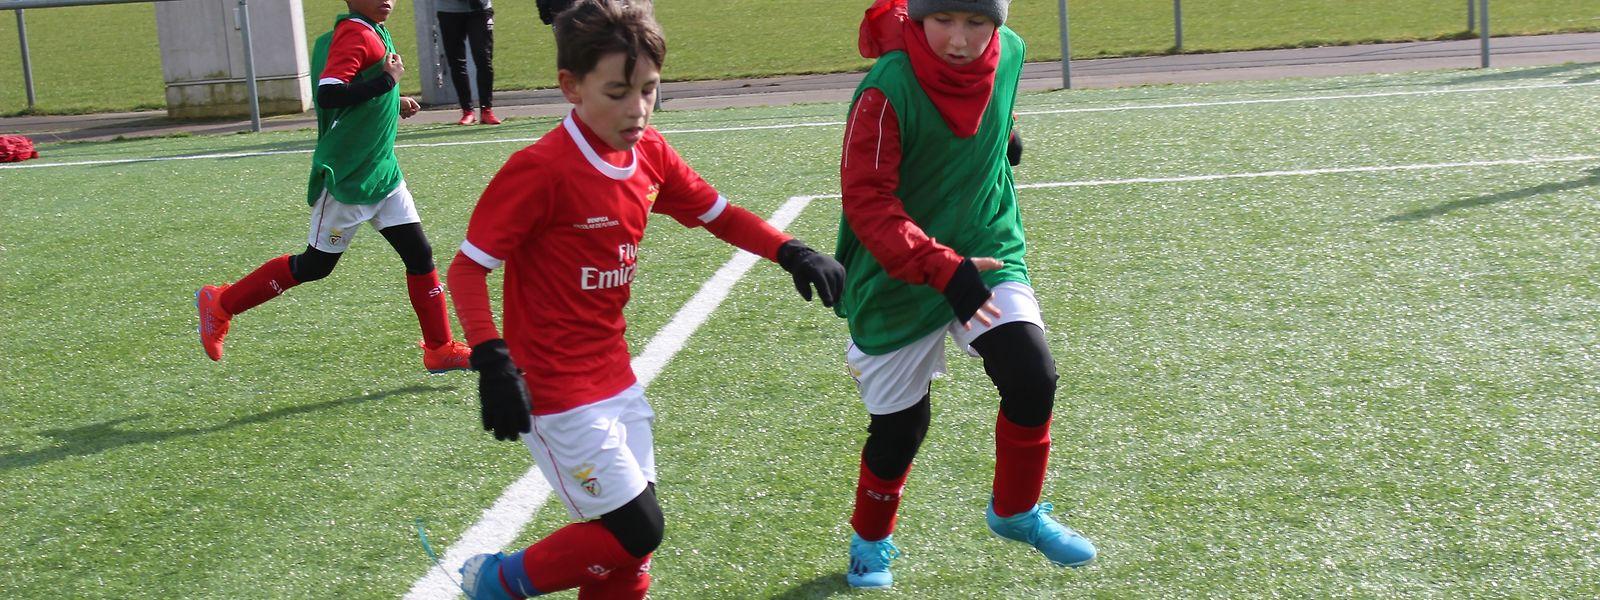 O futebol está de volta para os mais pequenos na Academia do Benfica no Luxemburgo.